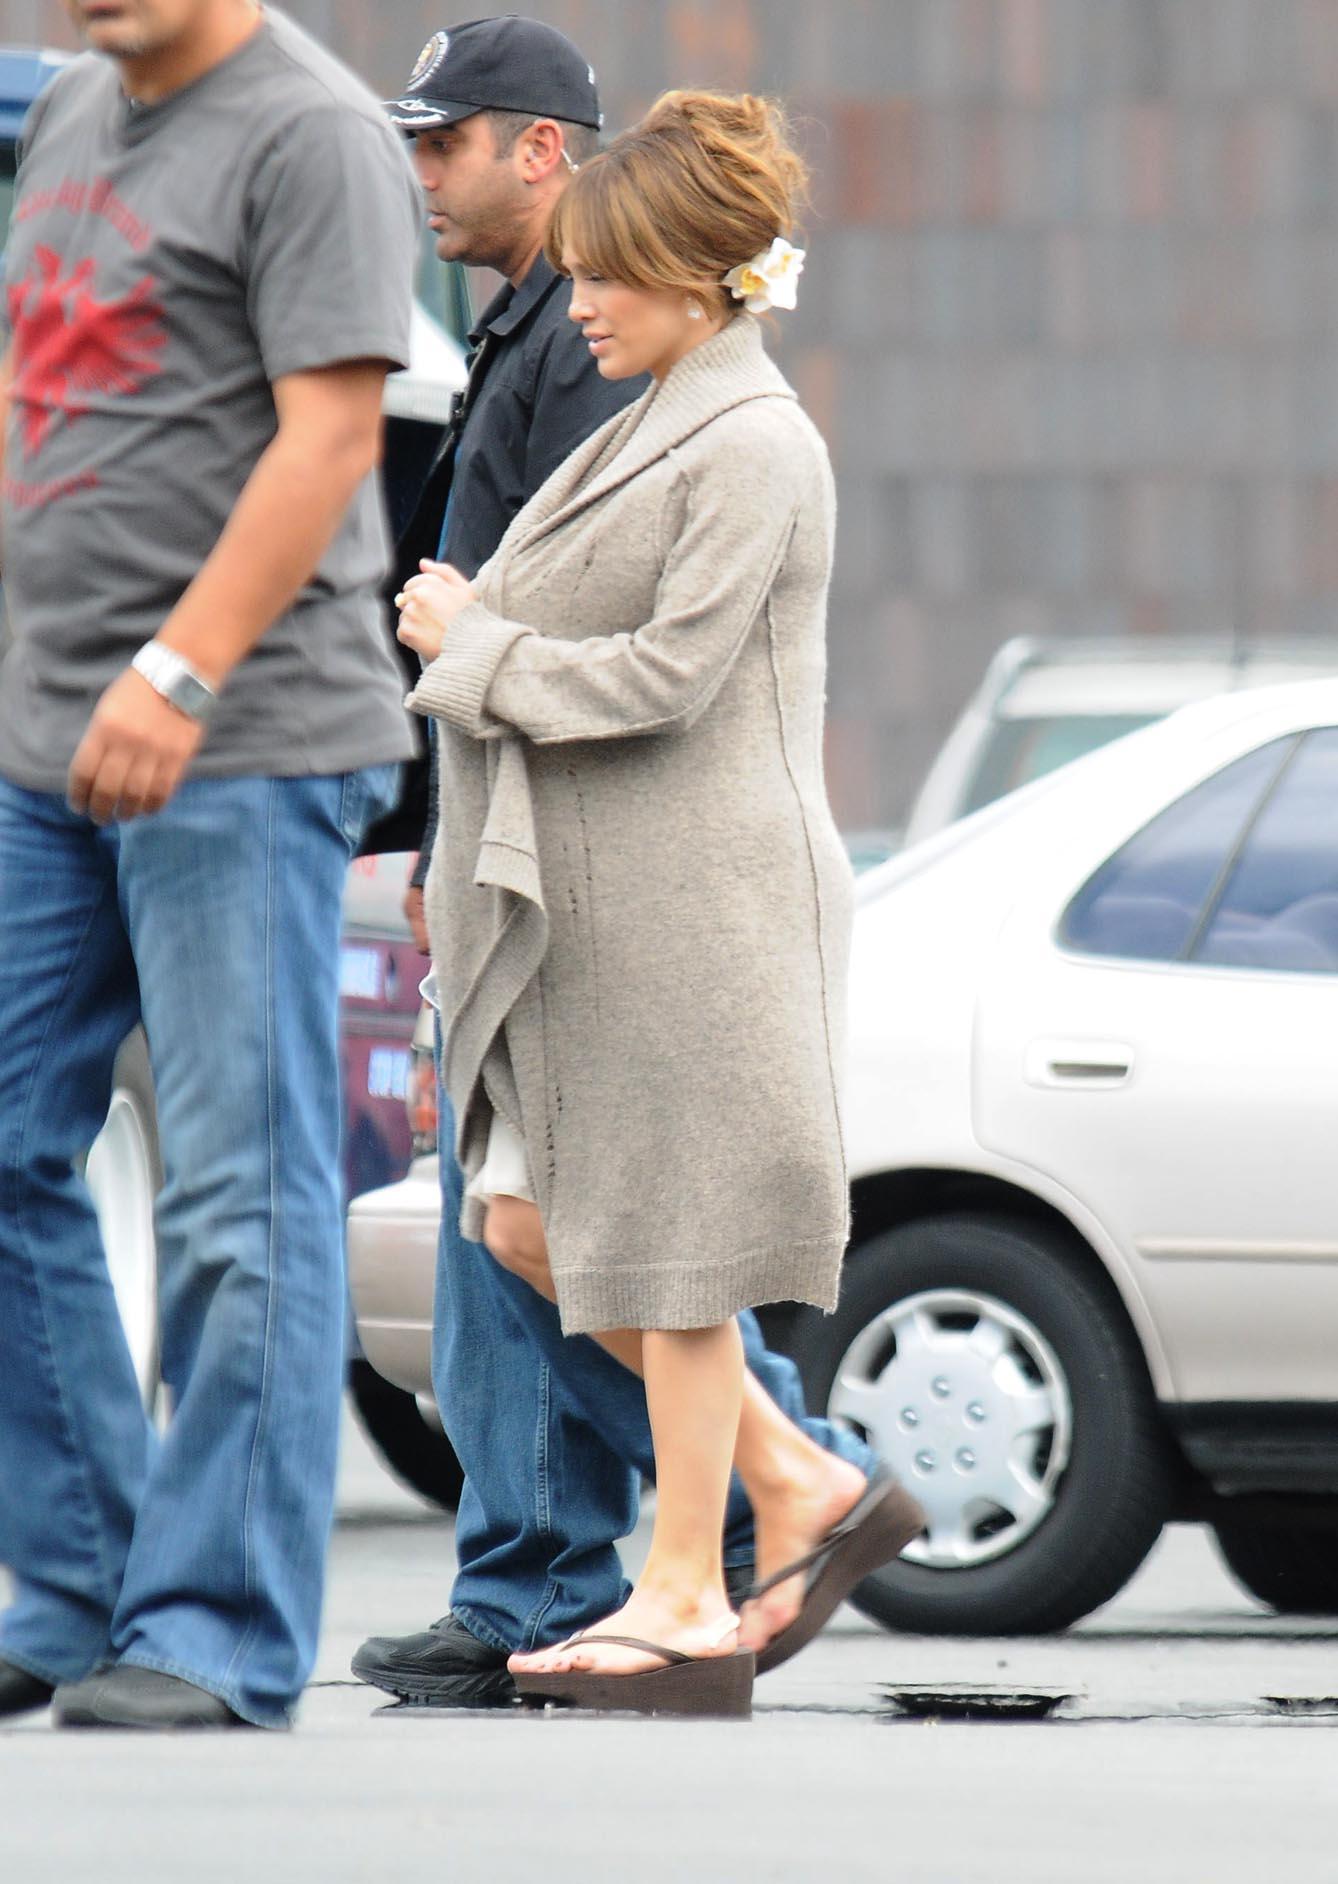 21181_Preppie_Jennifer_Lopez_on_The_Back-Up_Plan_set_in_L.A._-_June_15_2009_753_122_138lo.JPG